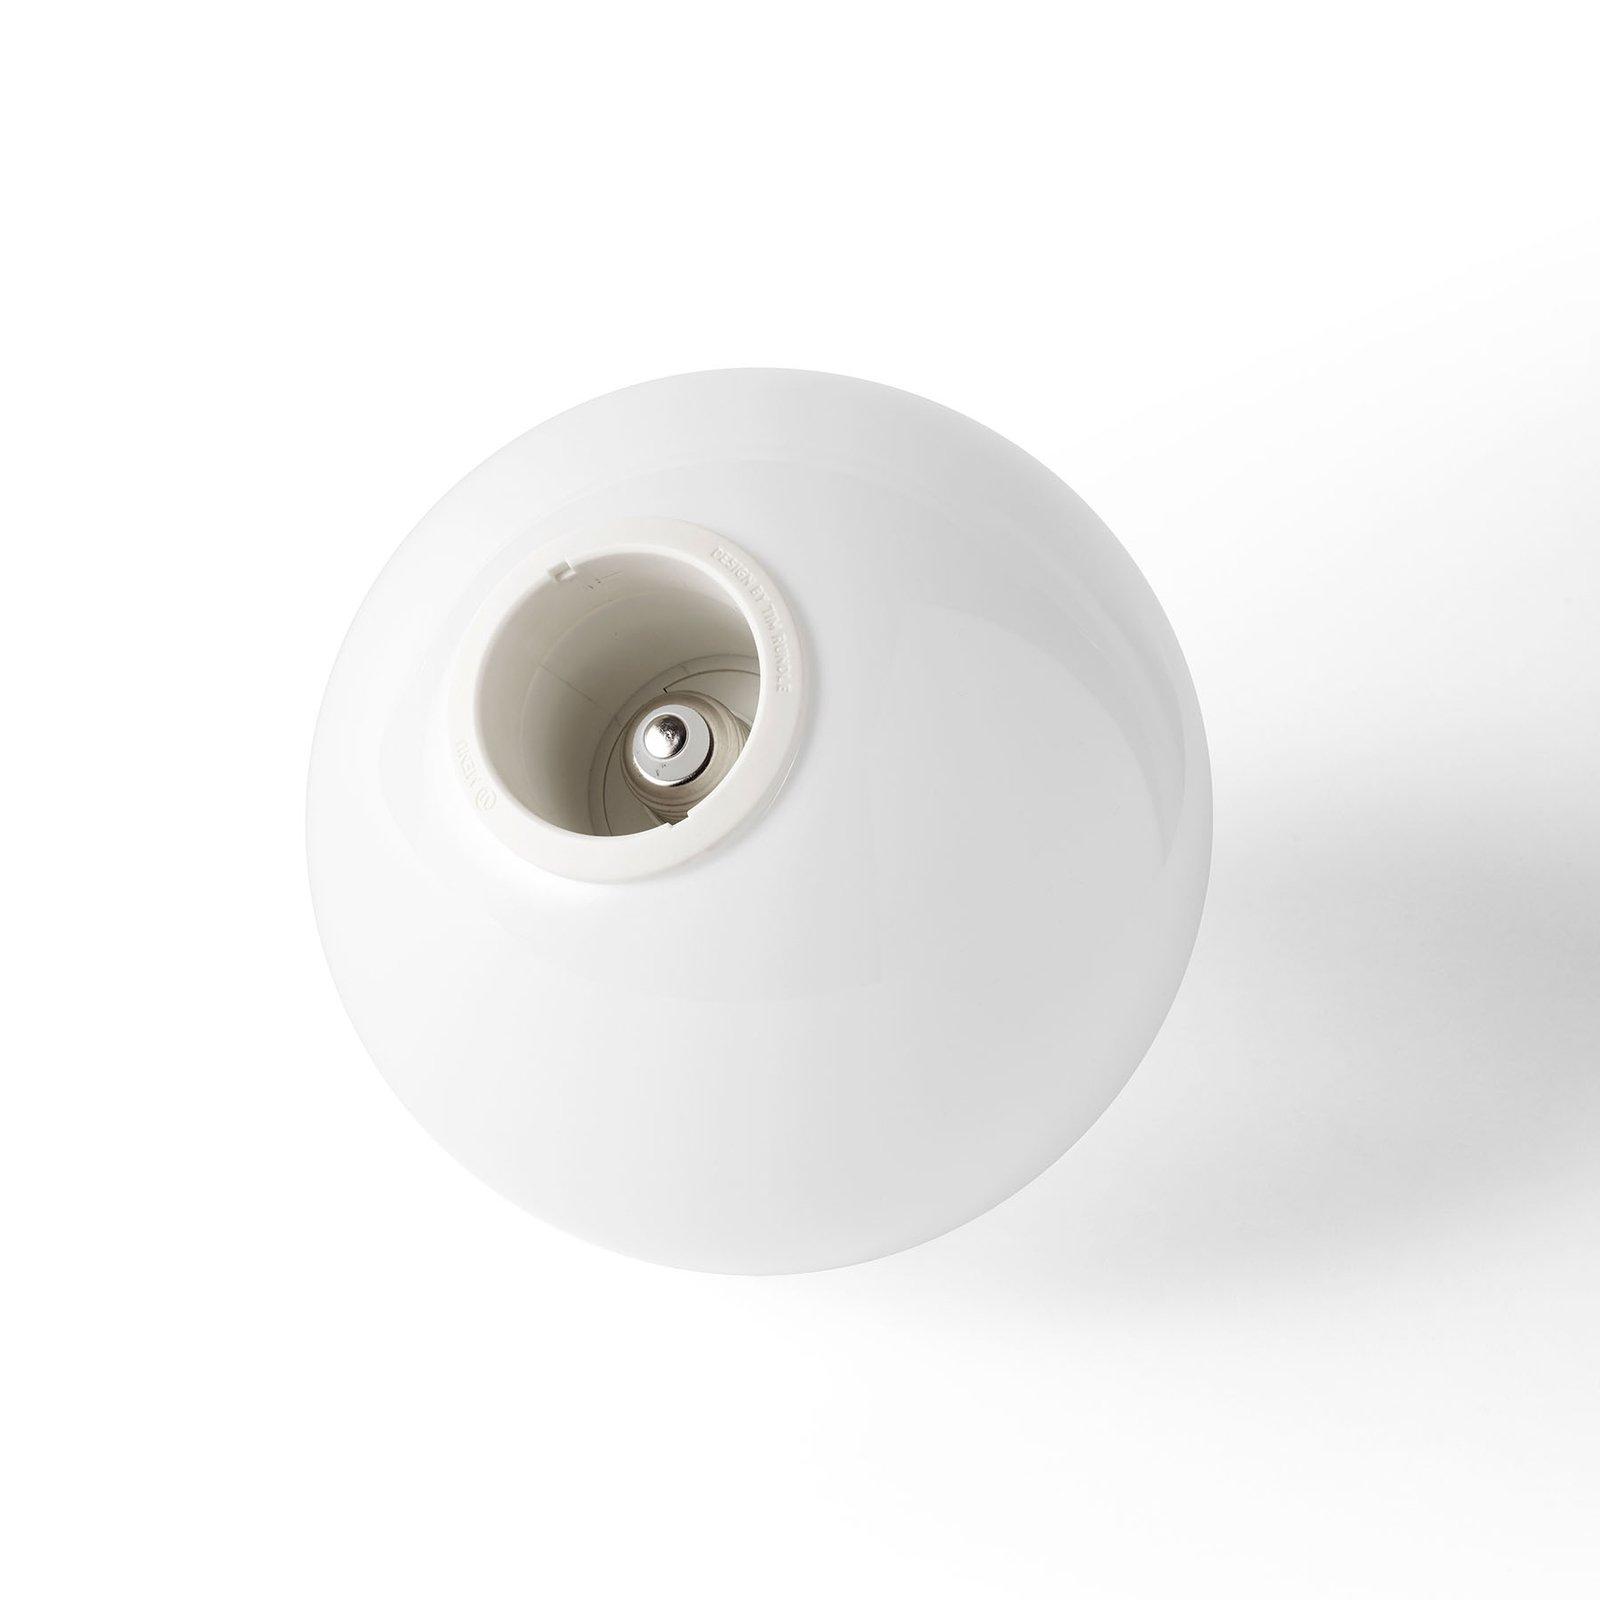 Menu TR Bulb LED-pære E27 6W dim to warm blank